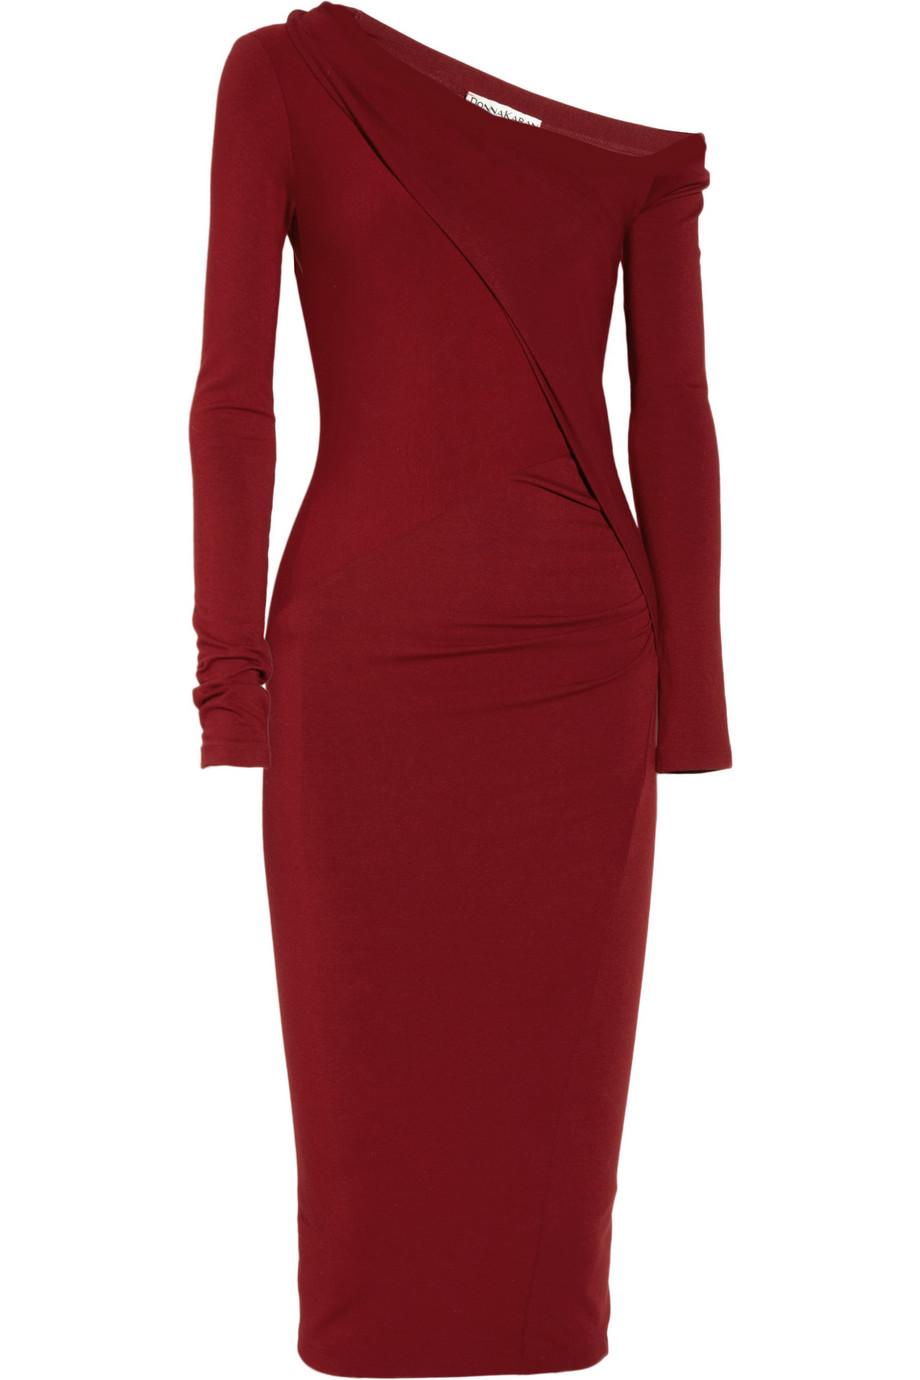 Donna Karan Modern Icons Asymmetric Stretch Jersey Dress